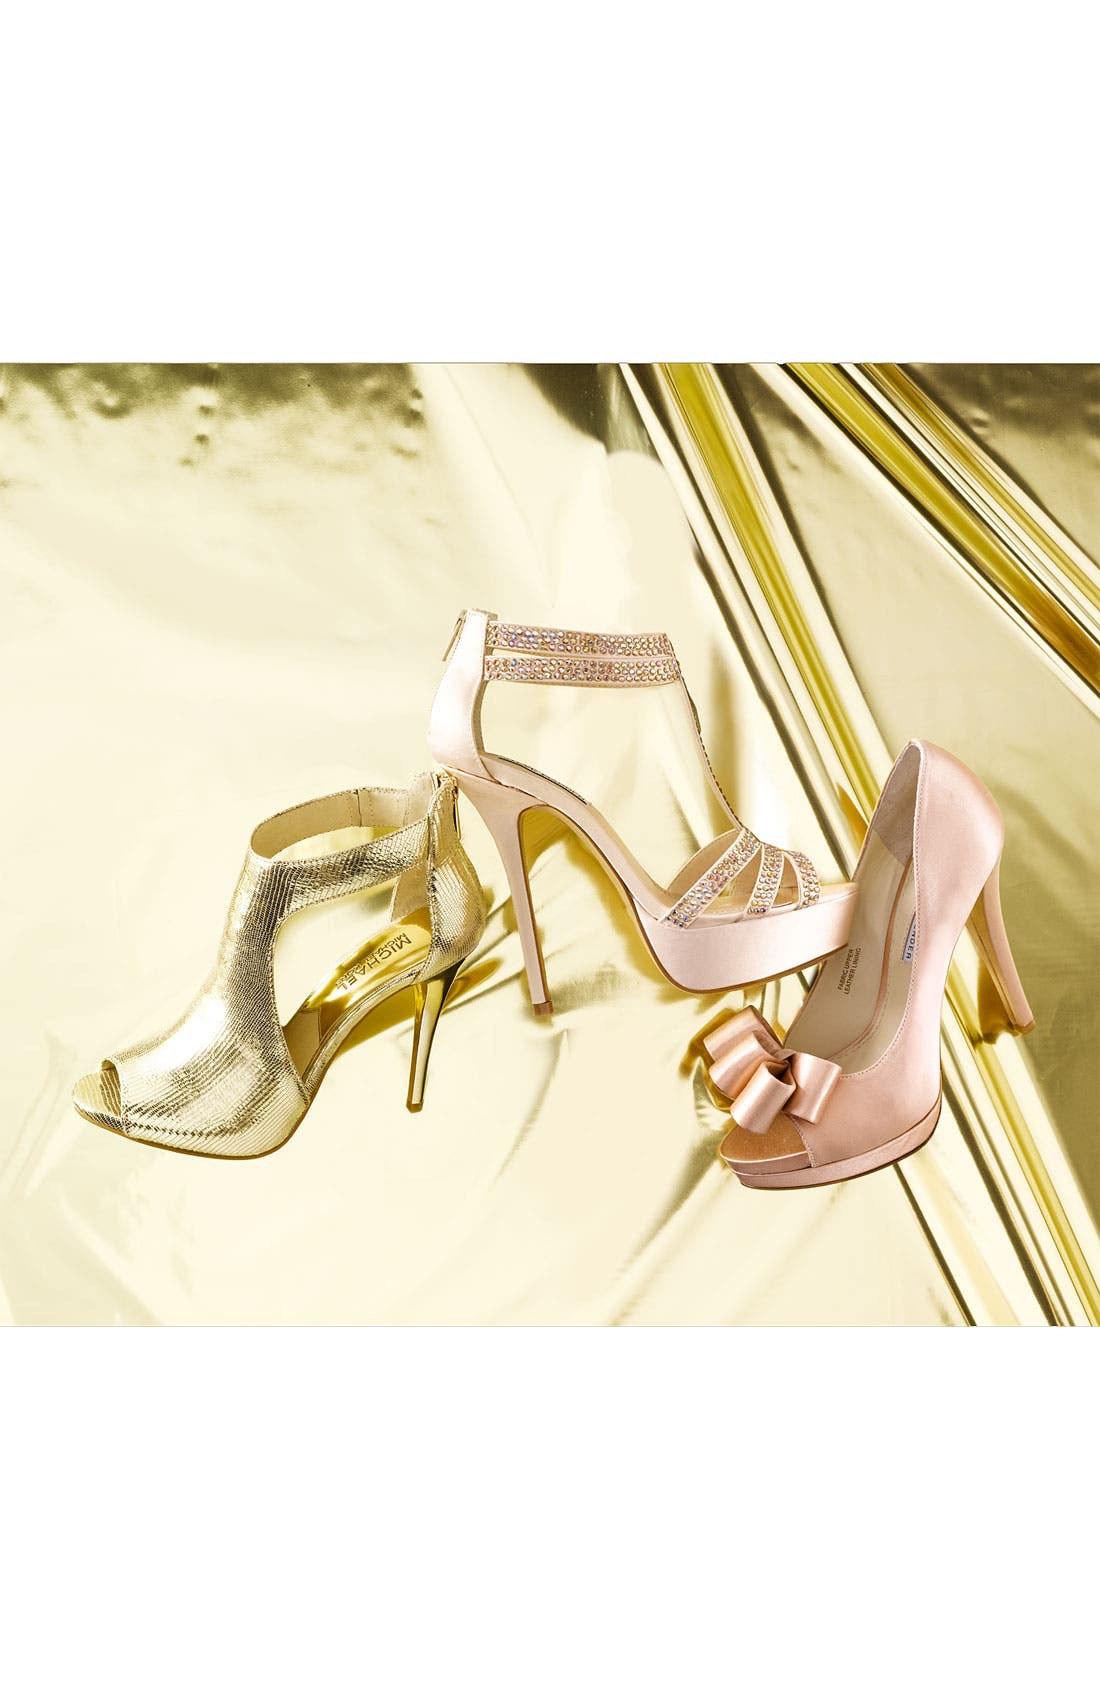 Footwear 'Sammy' Peep Toe Pump,                             Alternate thumbnail 5, color,                             250